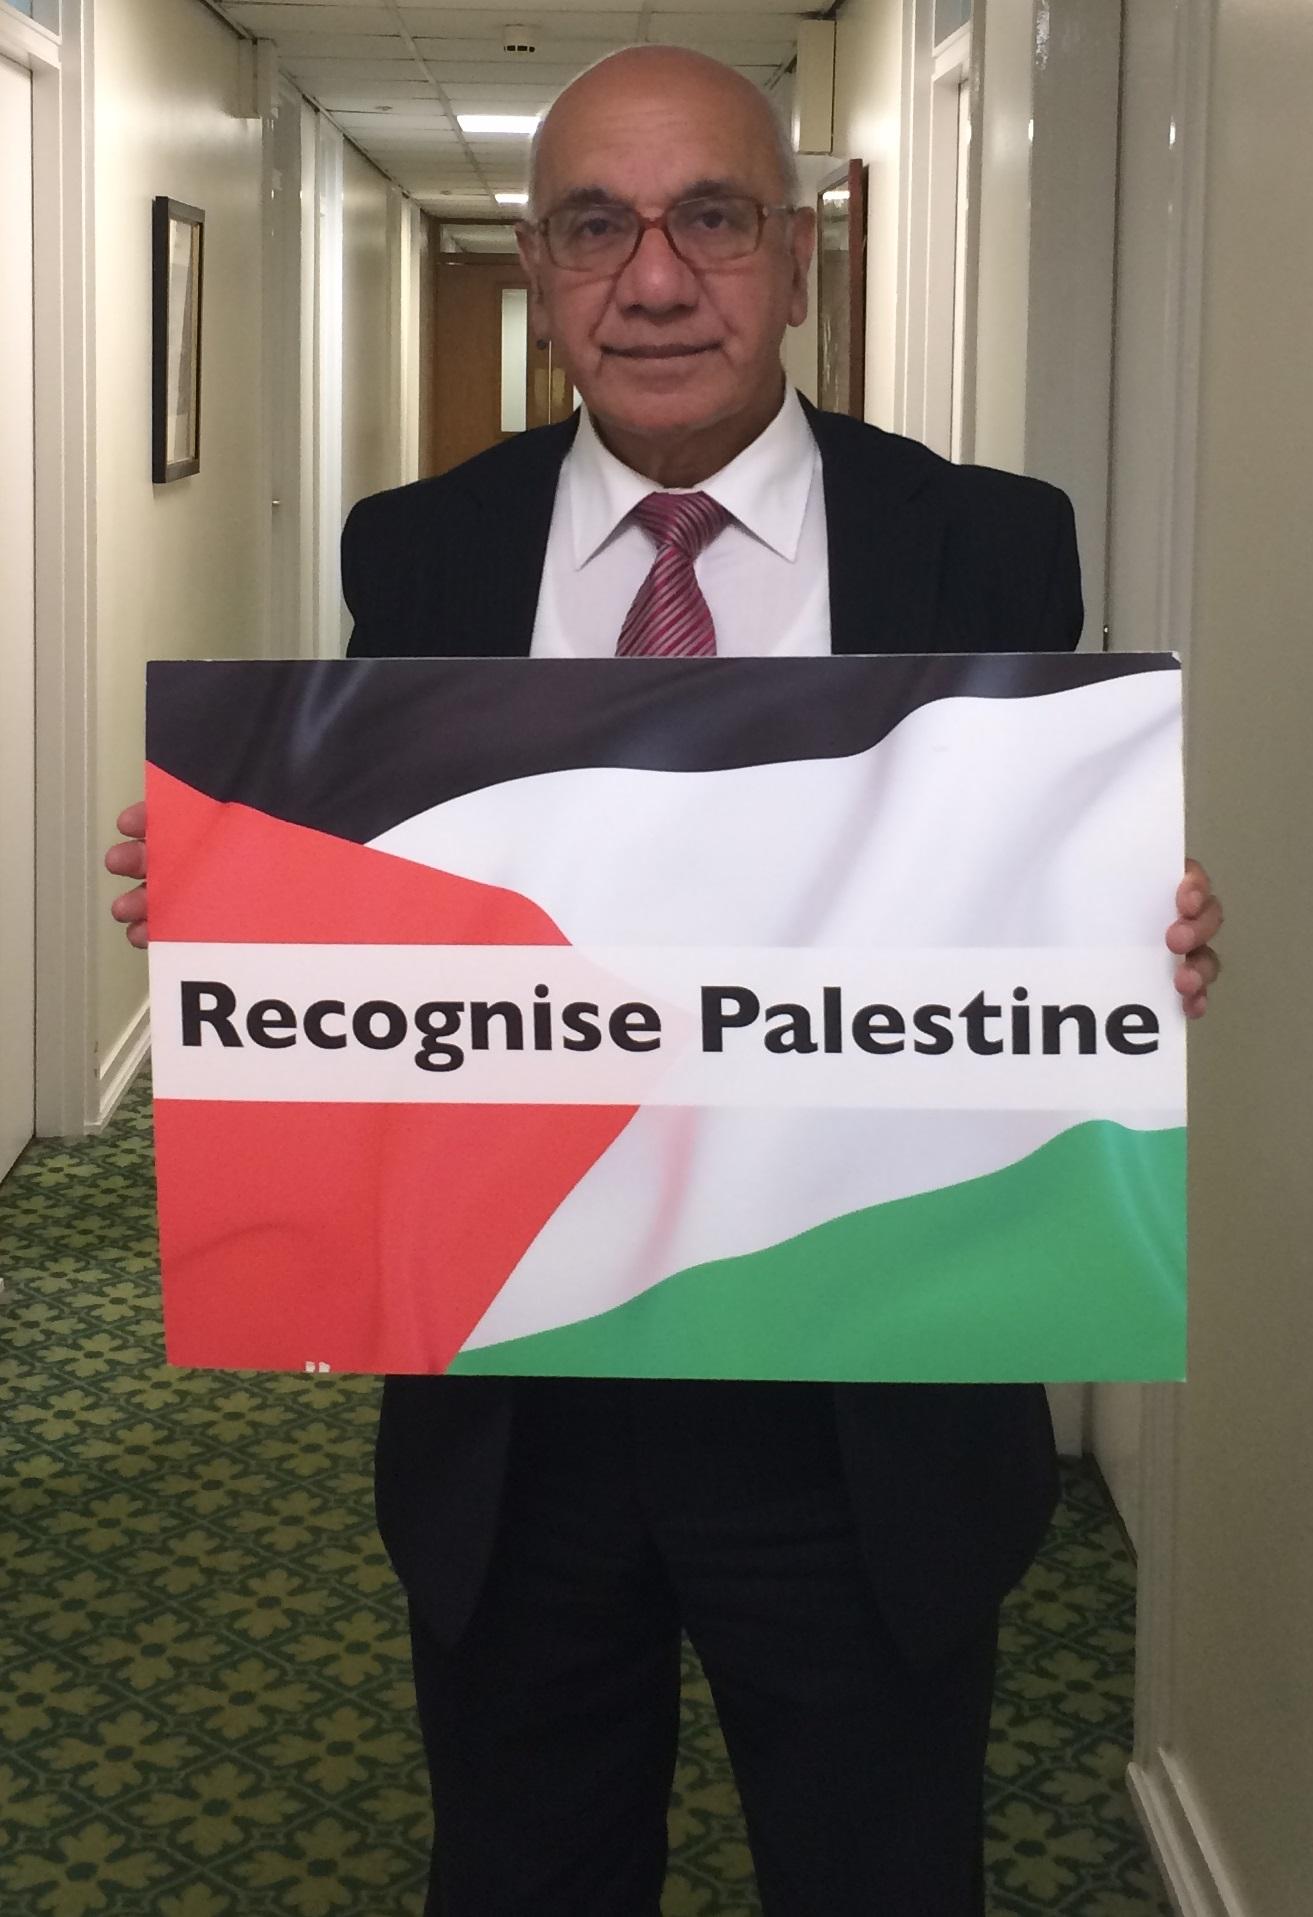 2014.10.13_Palestine_Recognition.jpg